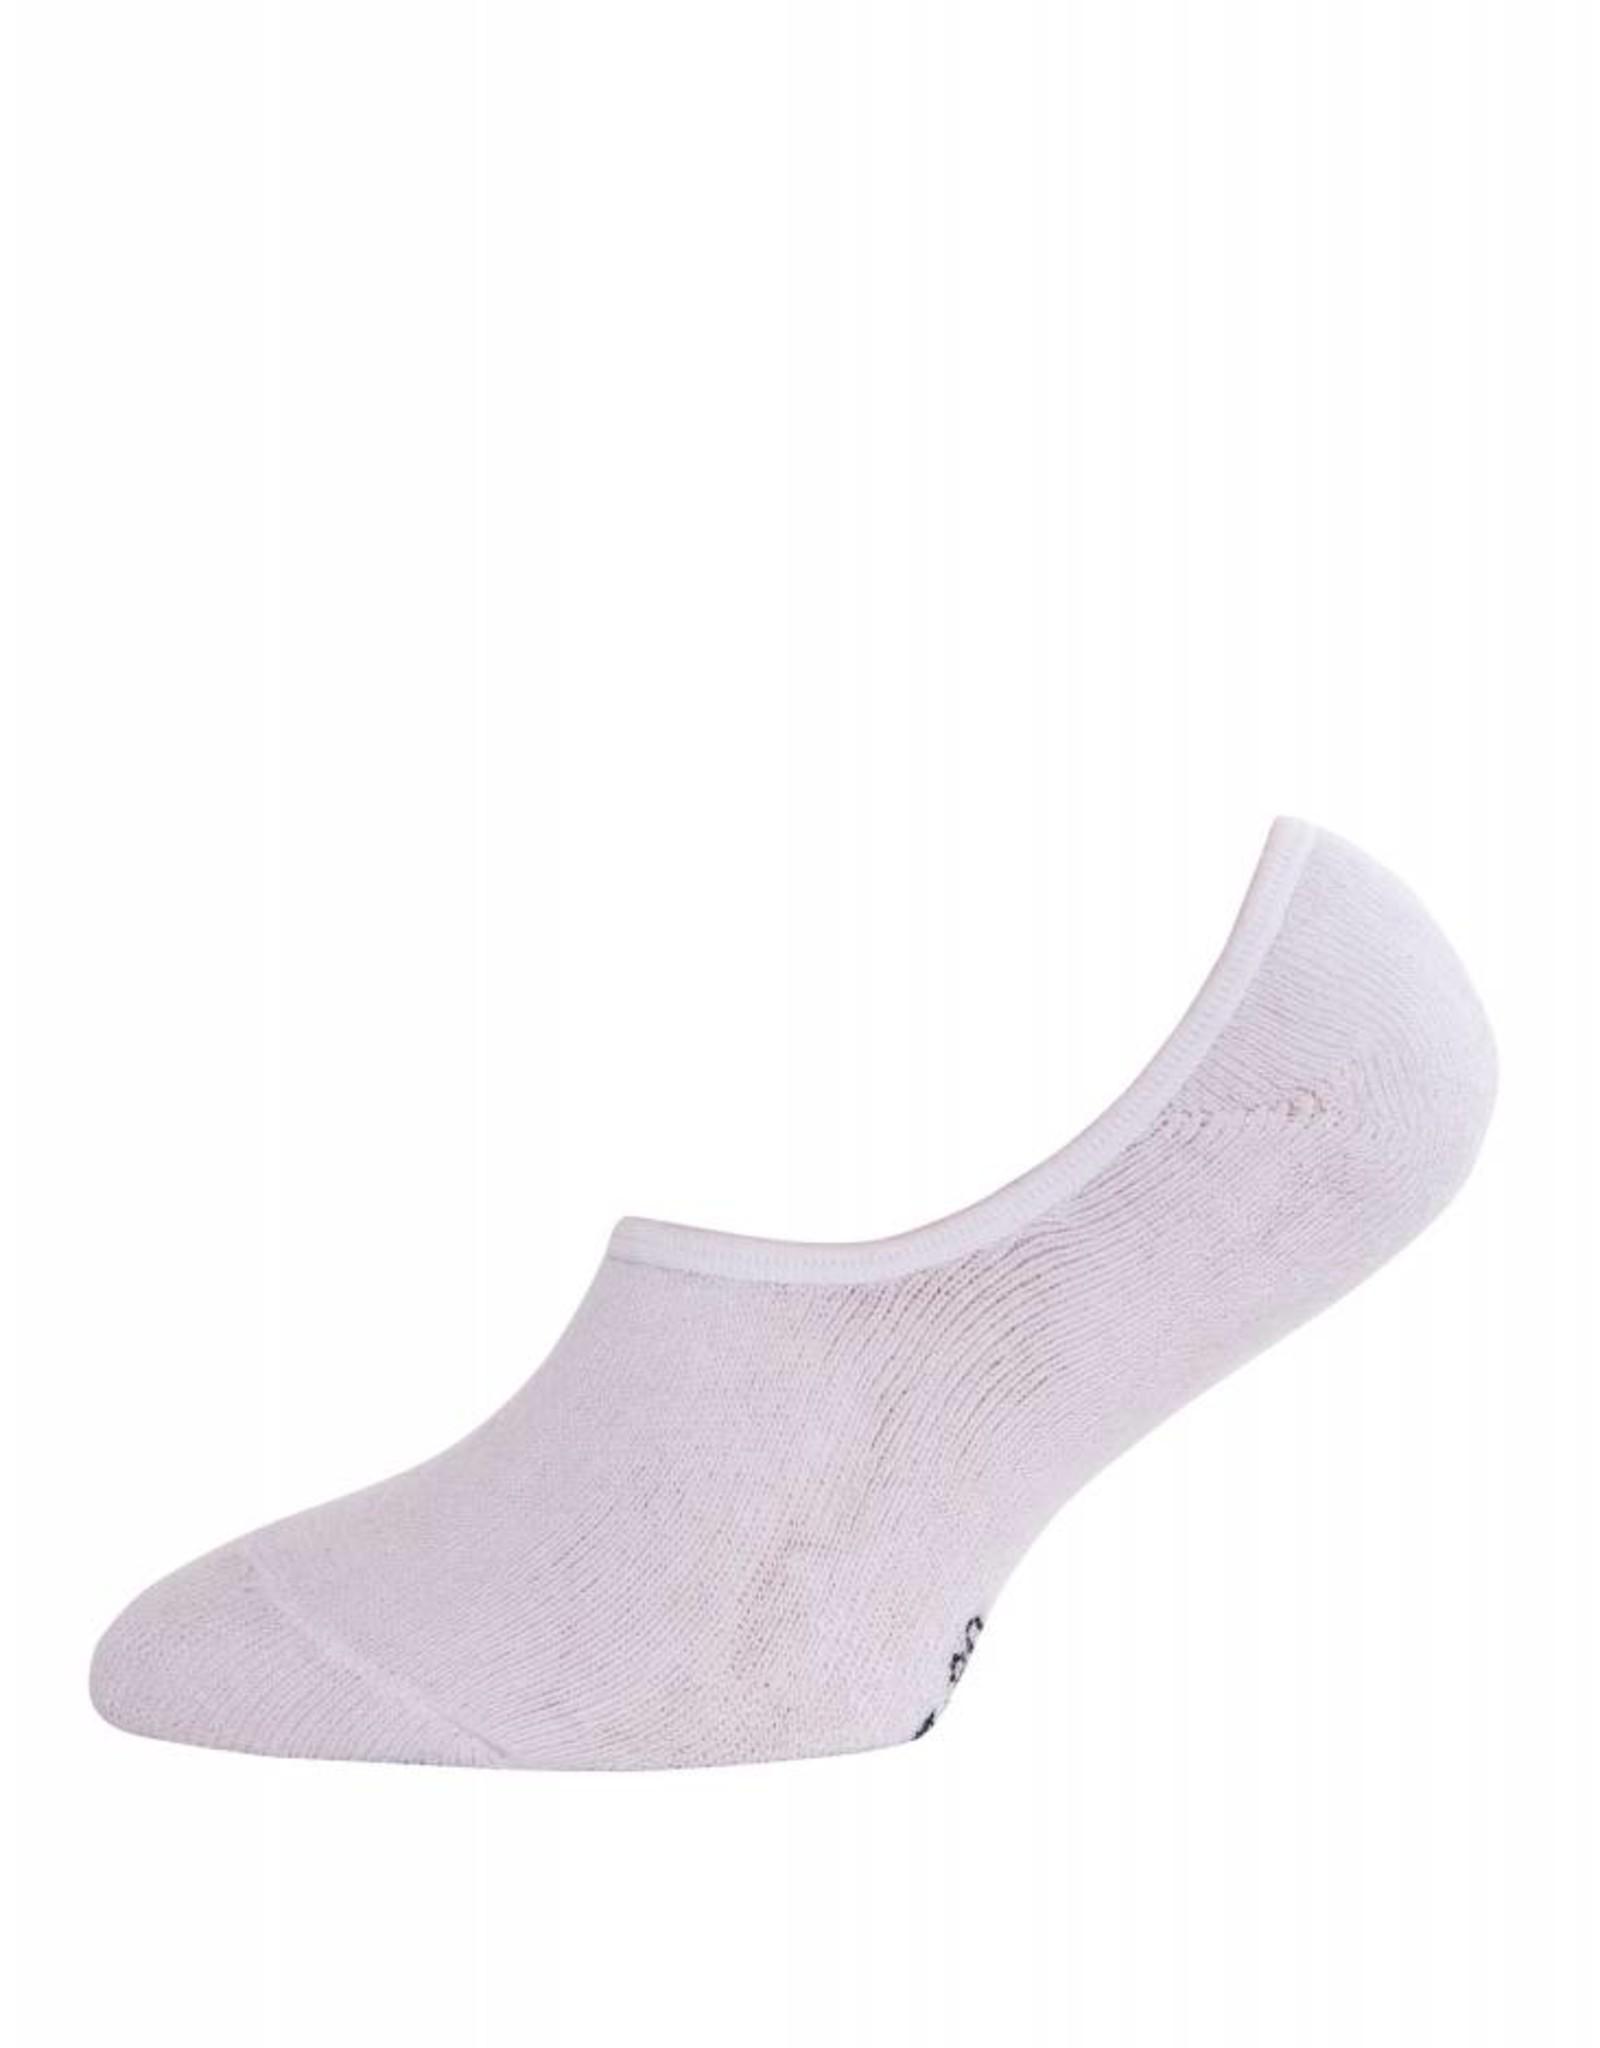 Ewers Sneaker Sokken Wit (2 Stuks)